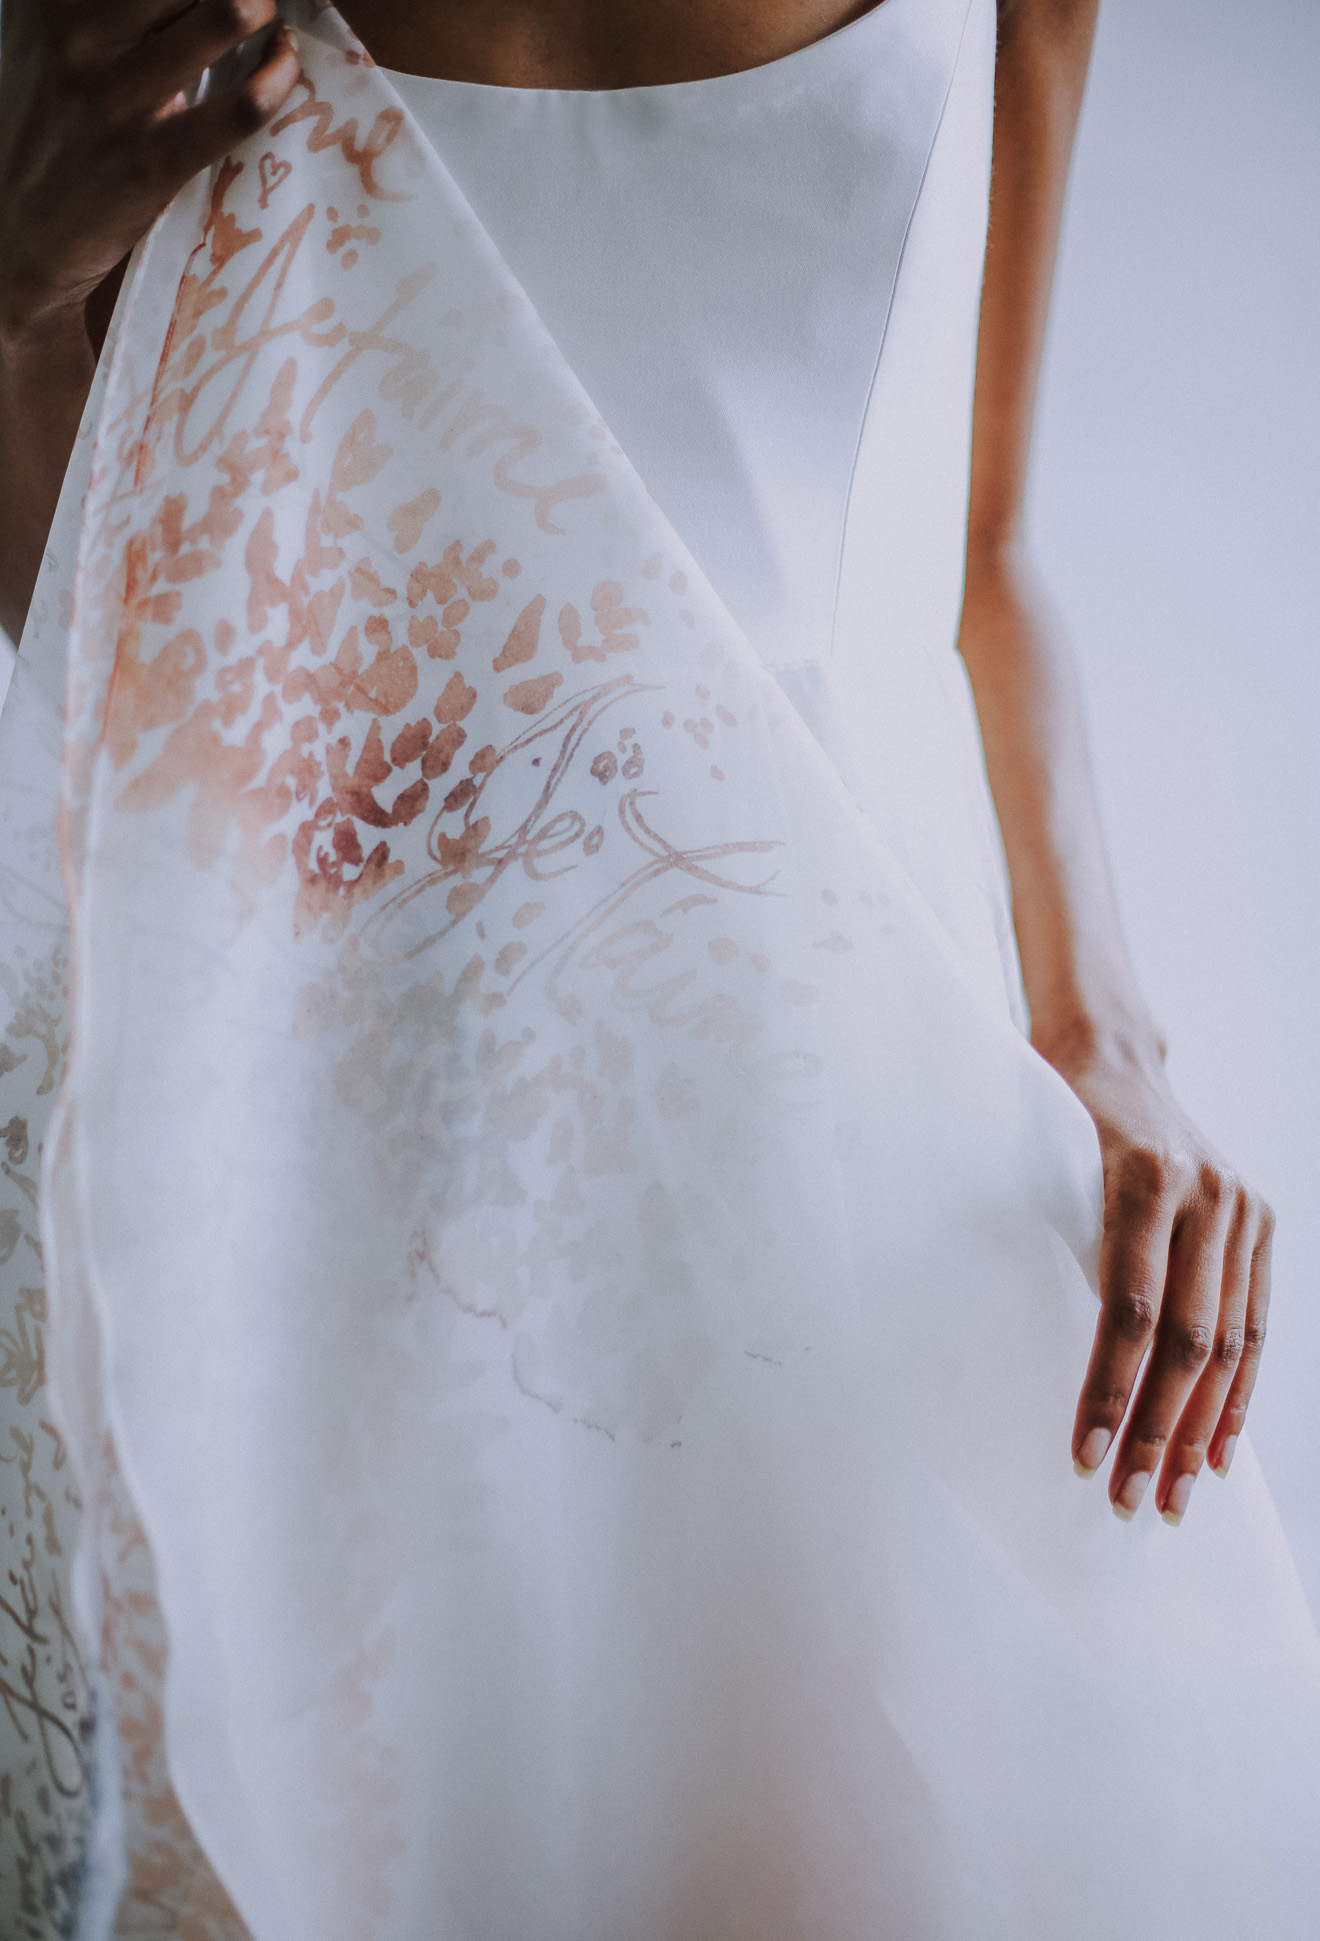 leanne-marshall-wedding-gown-8.jpg